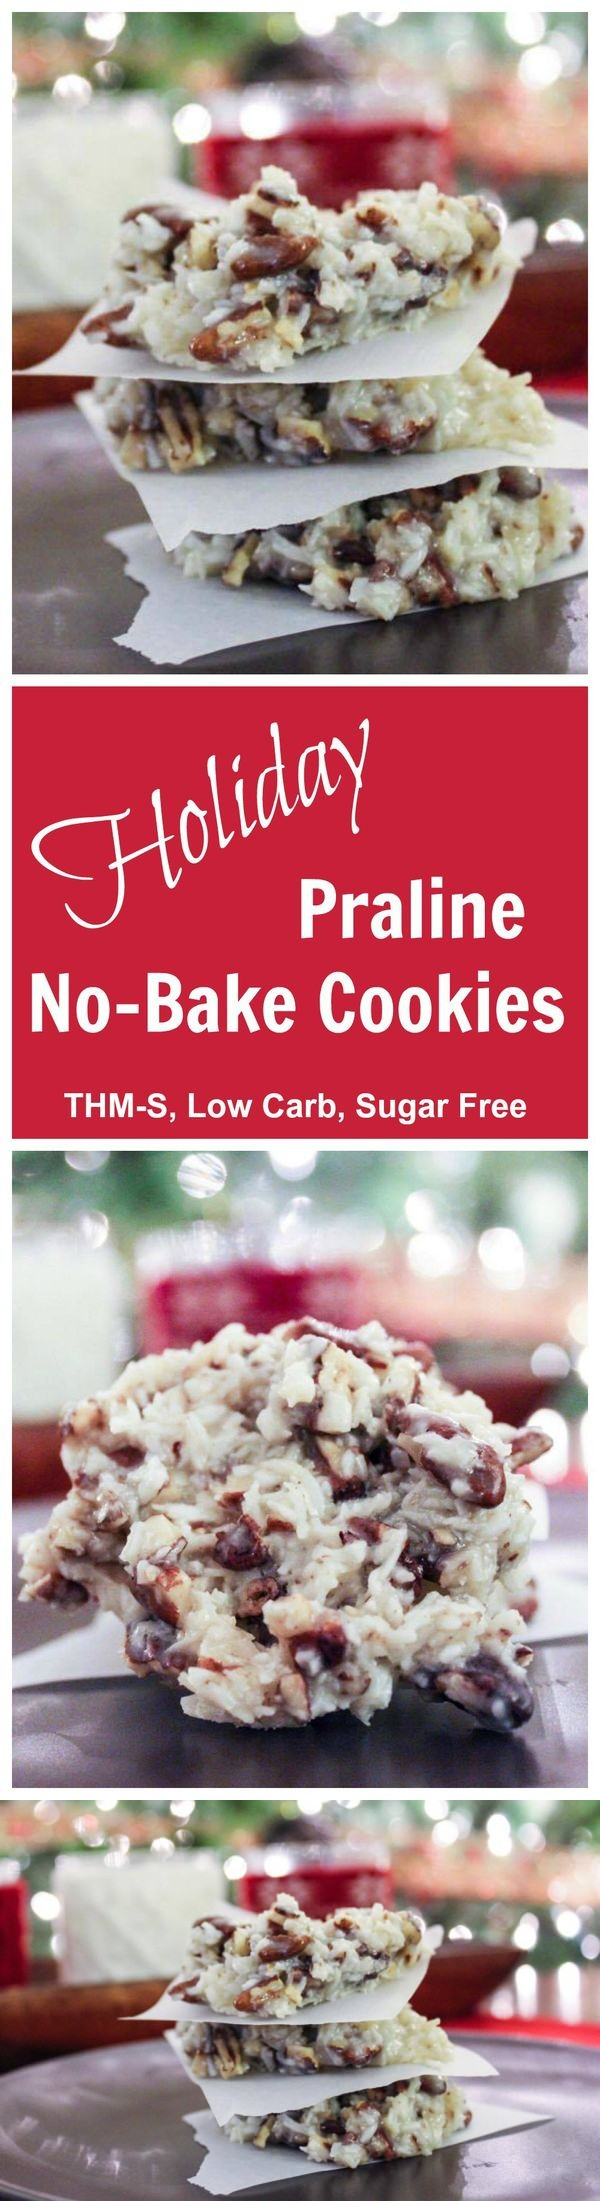 Holiday Praline No-Bake Cookies (THM-S, Low Carb, Sugar Free